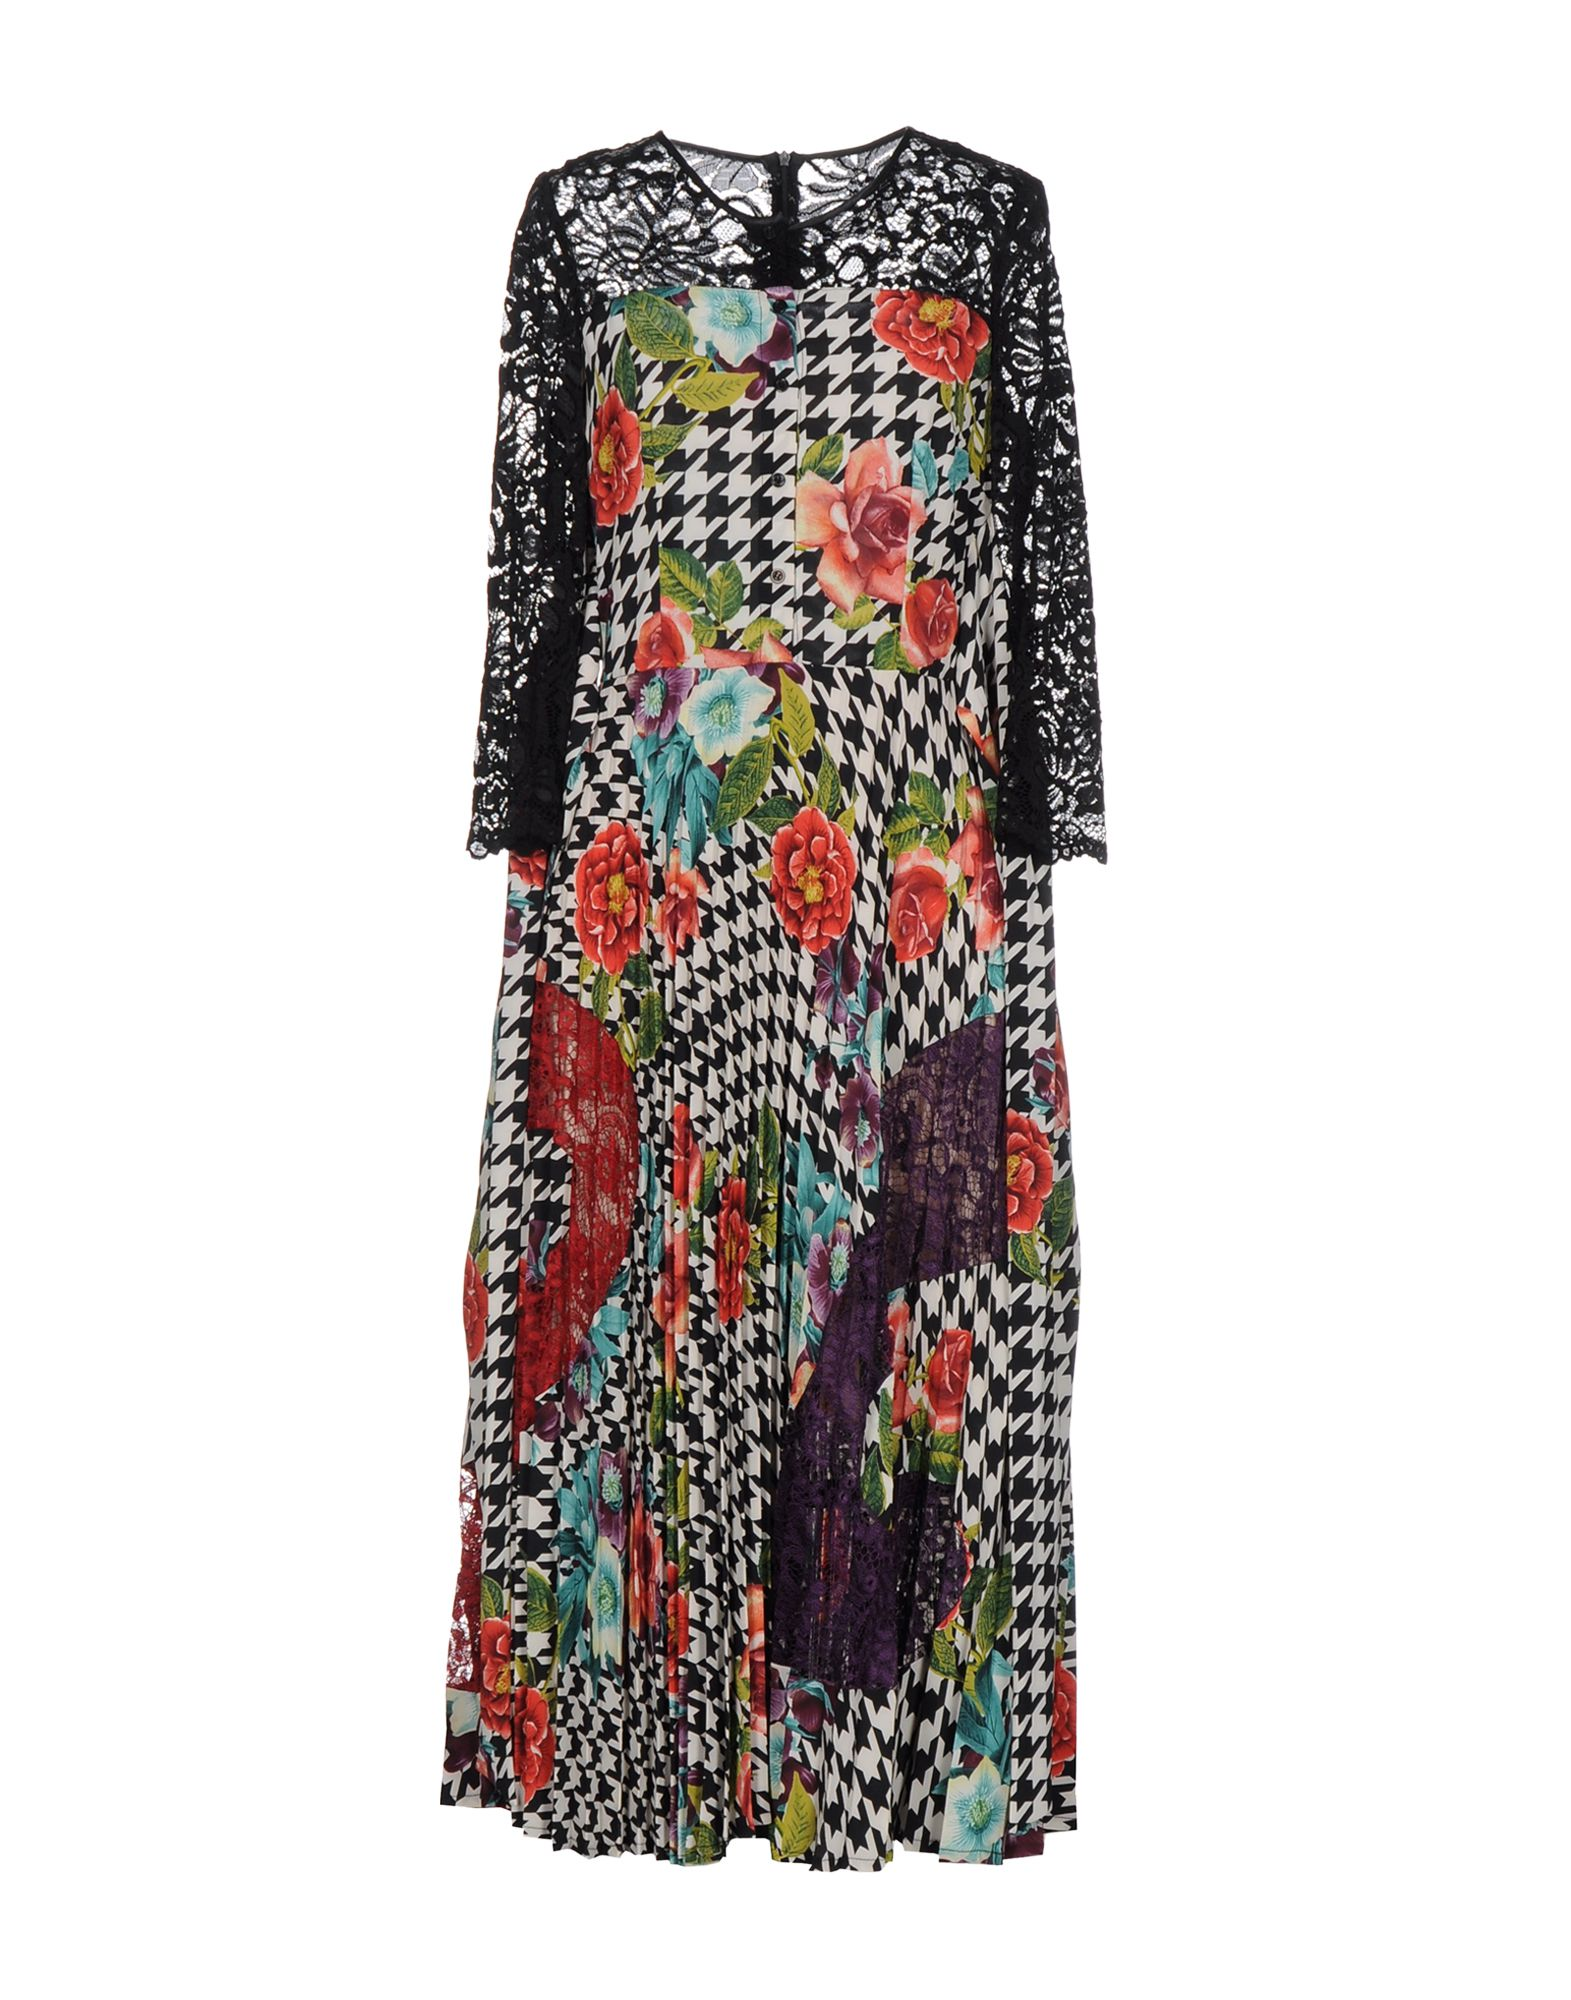 TENAX Платье длиной 3/4 lisa corti платье длиной 3 4